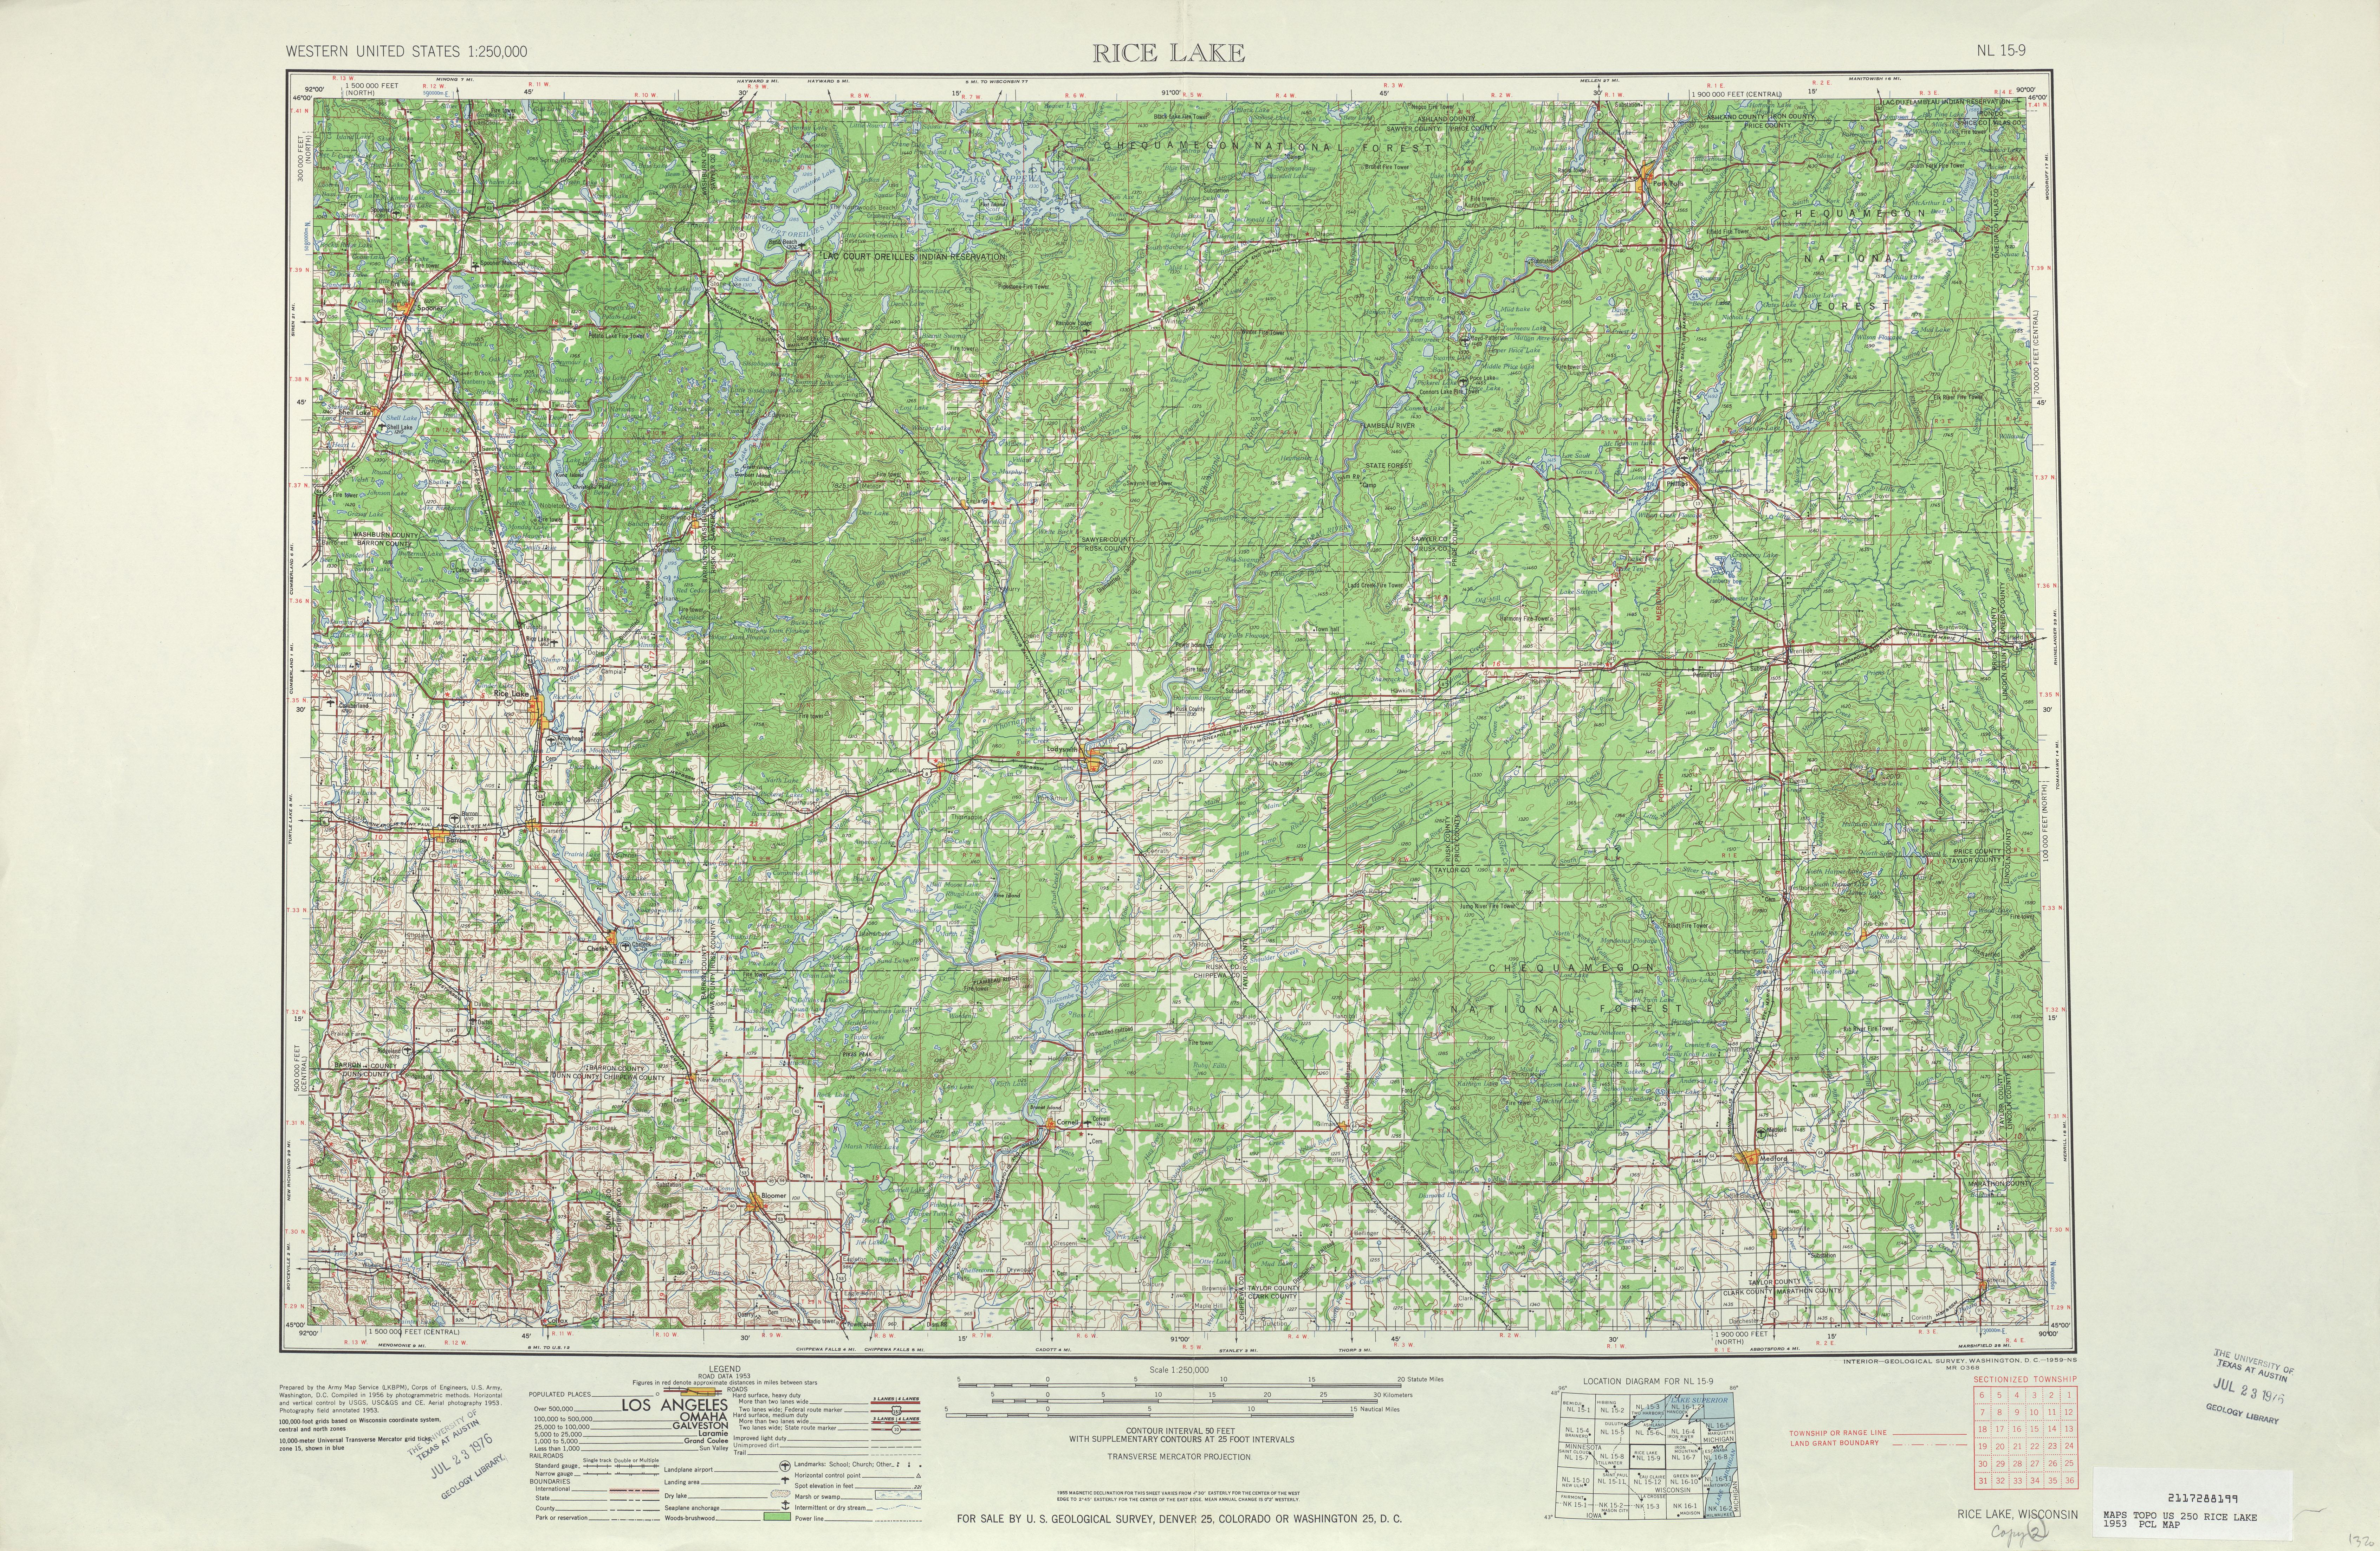 Rice Lake Topographic Map Sheet, United States 1953